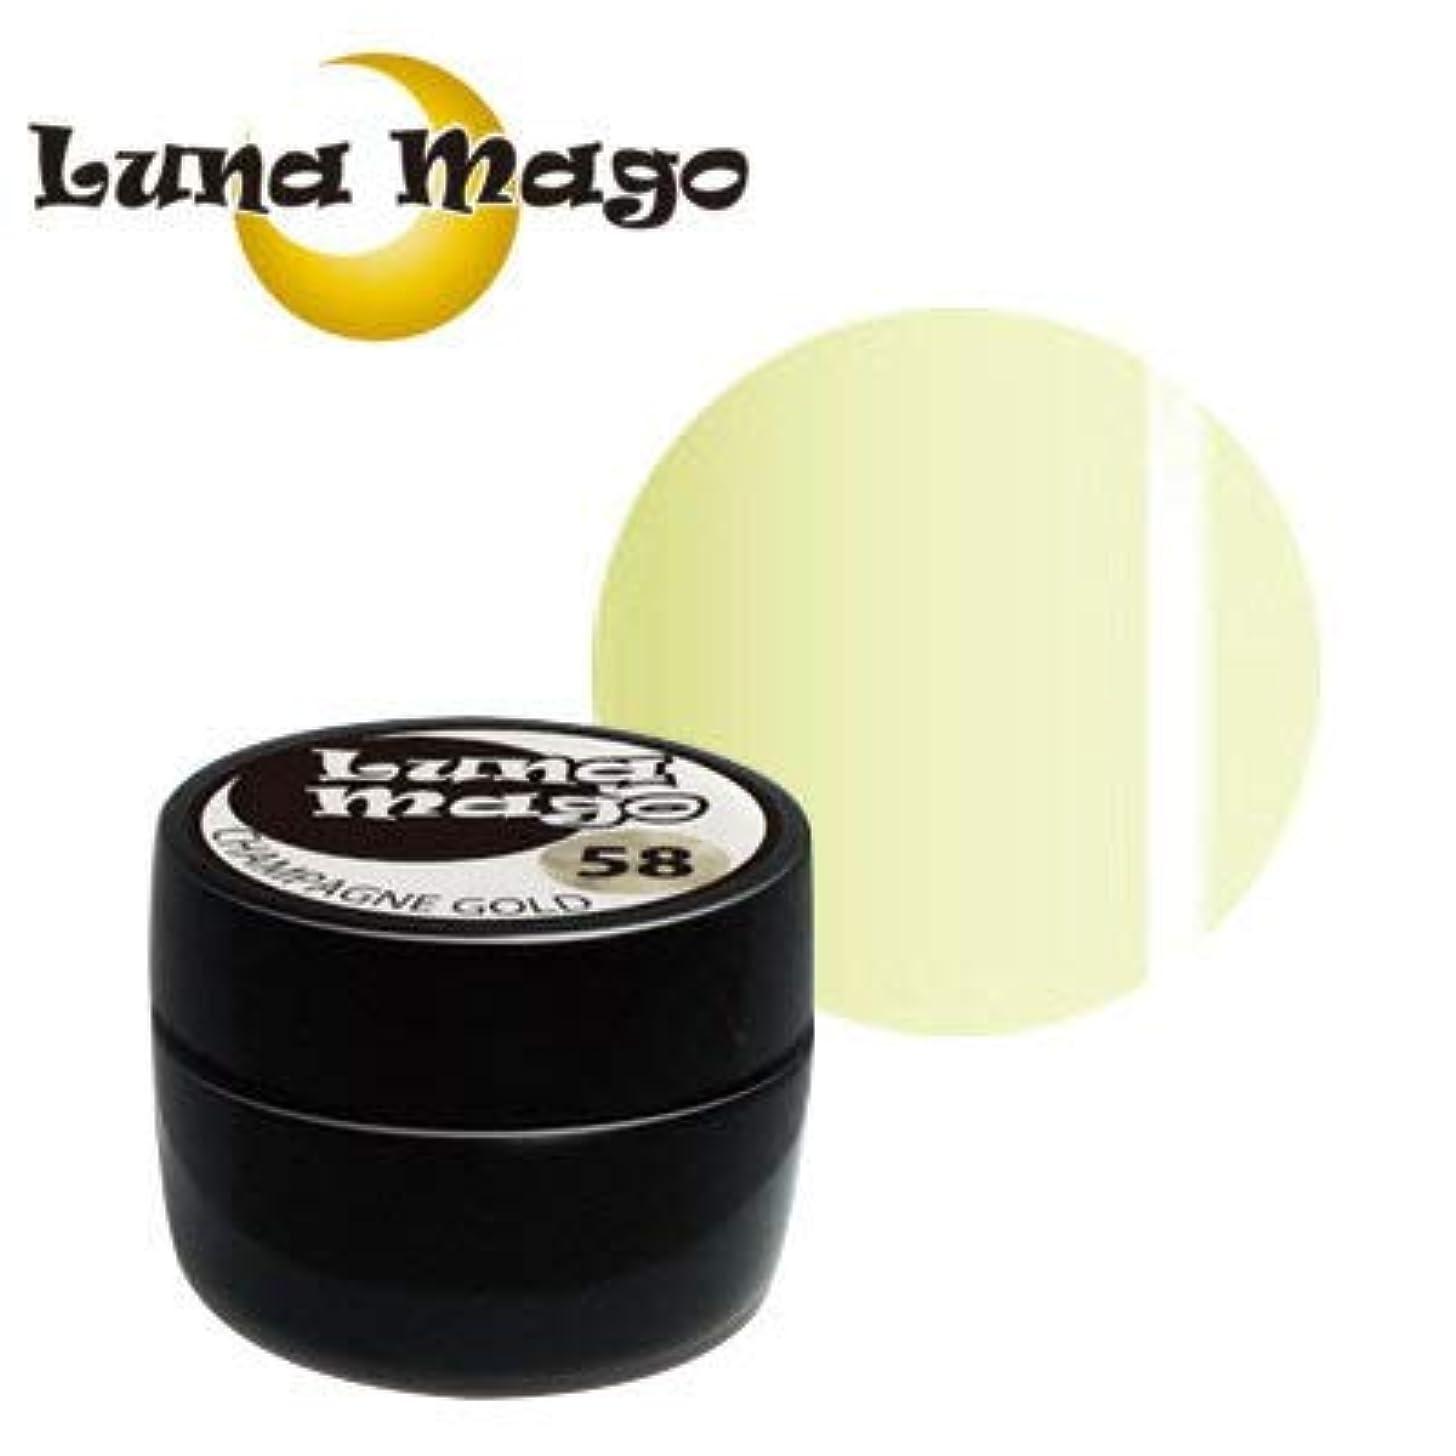 Luna Mago カラージェル 5g 004 クリーム